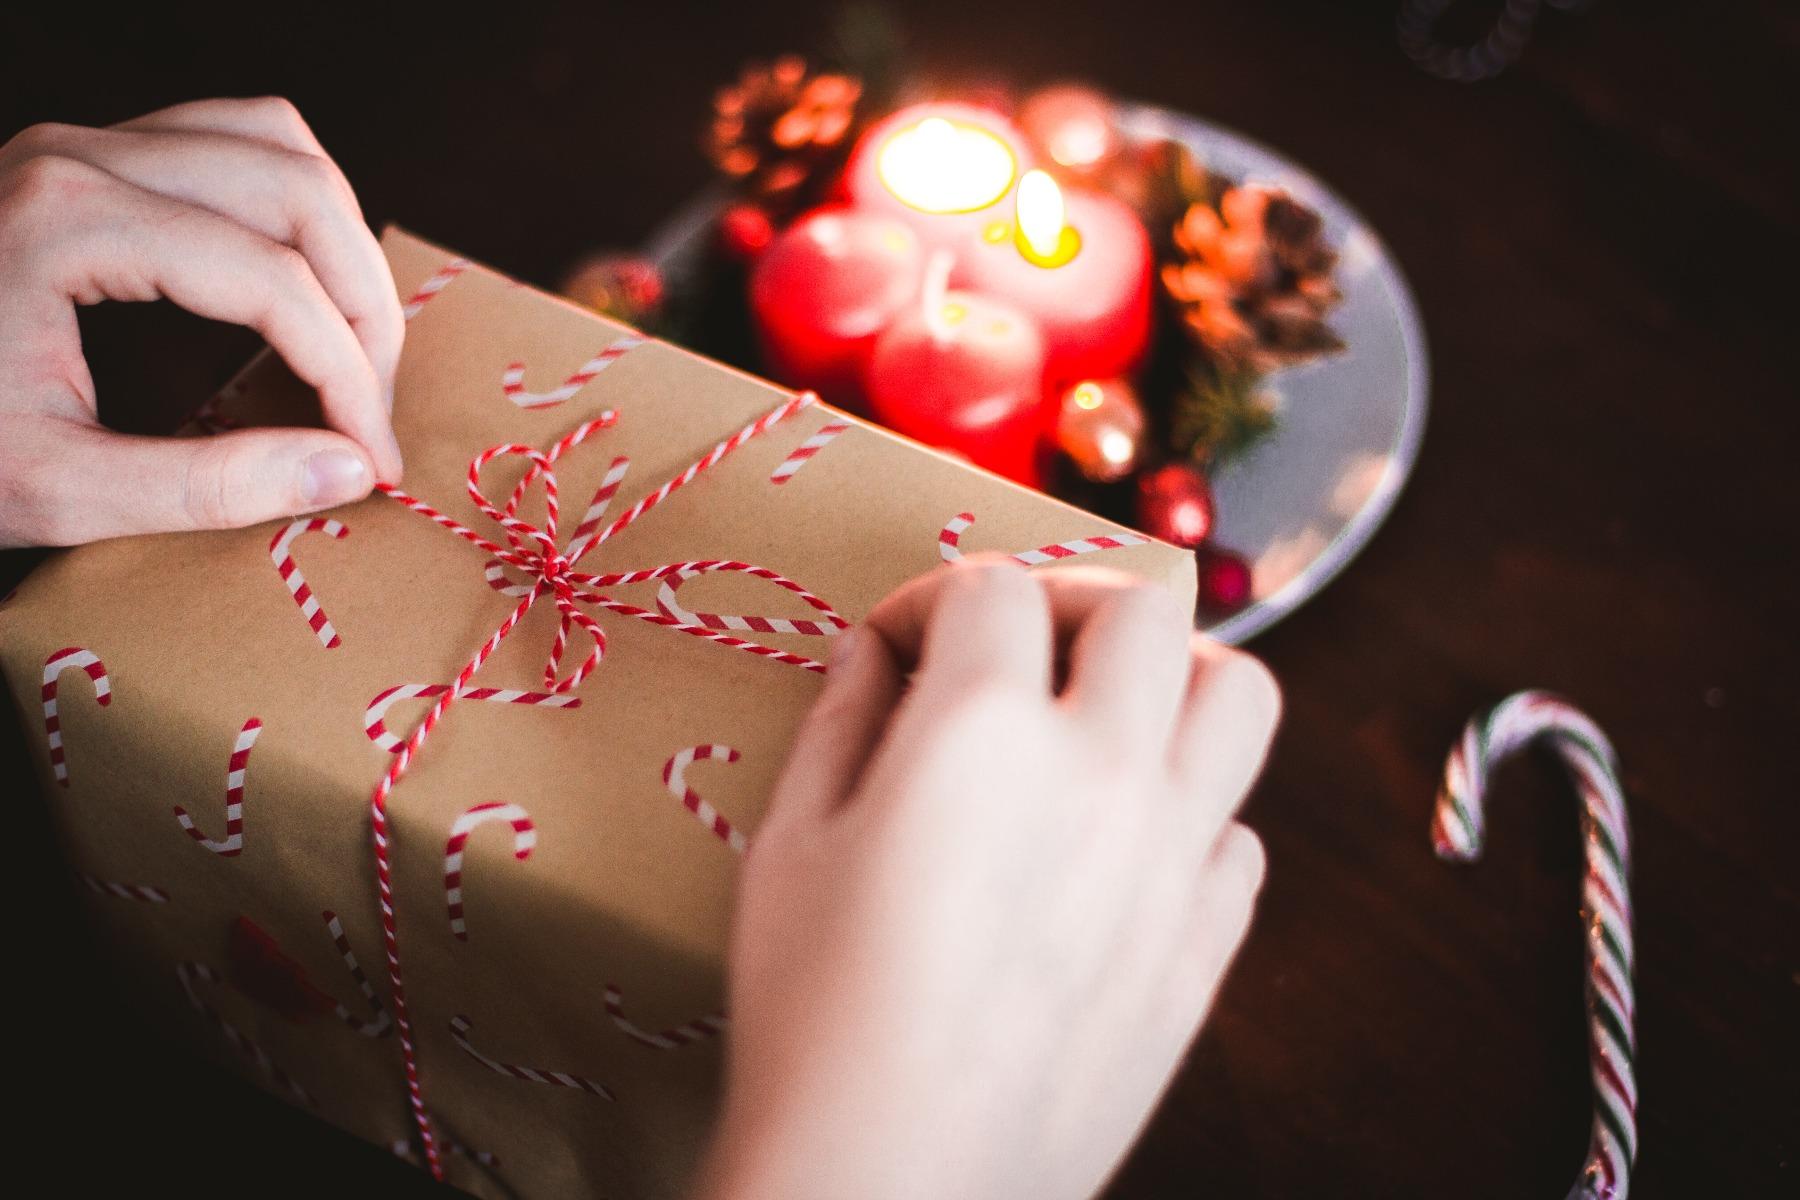 Kilkenny Shop Sending Christmas Gifts To Ireland